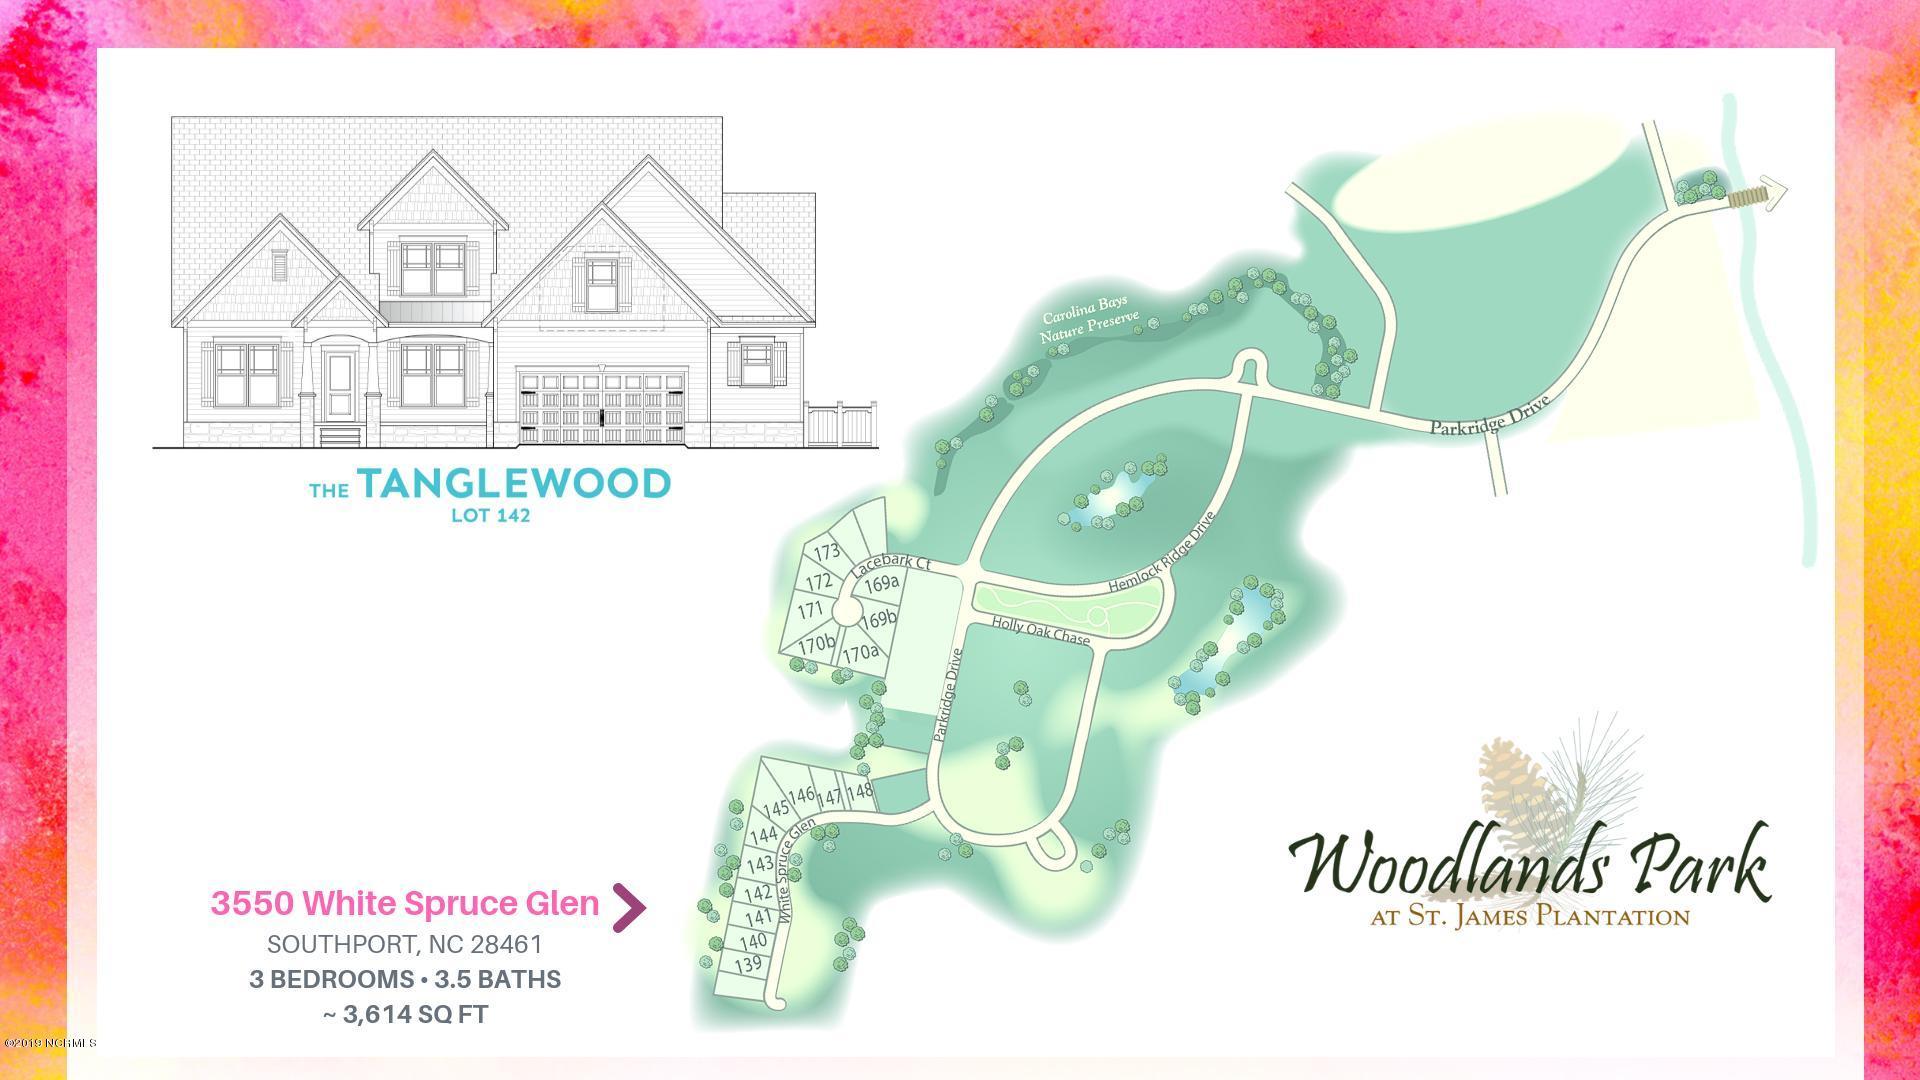 3550 White Spruce Glen Southport, NC 28461